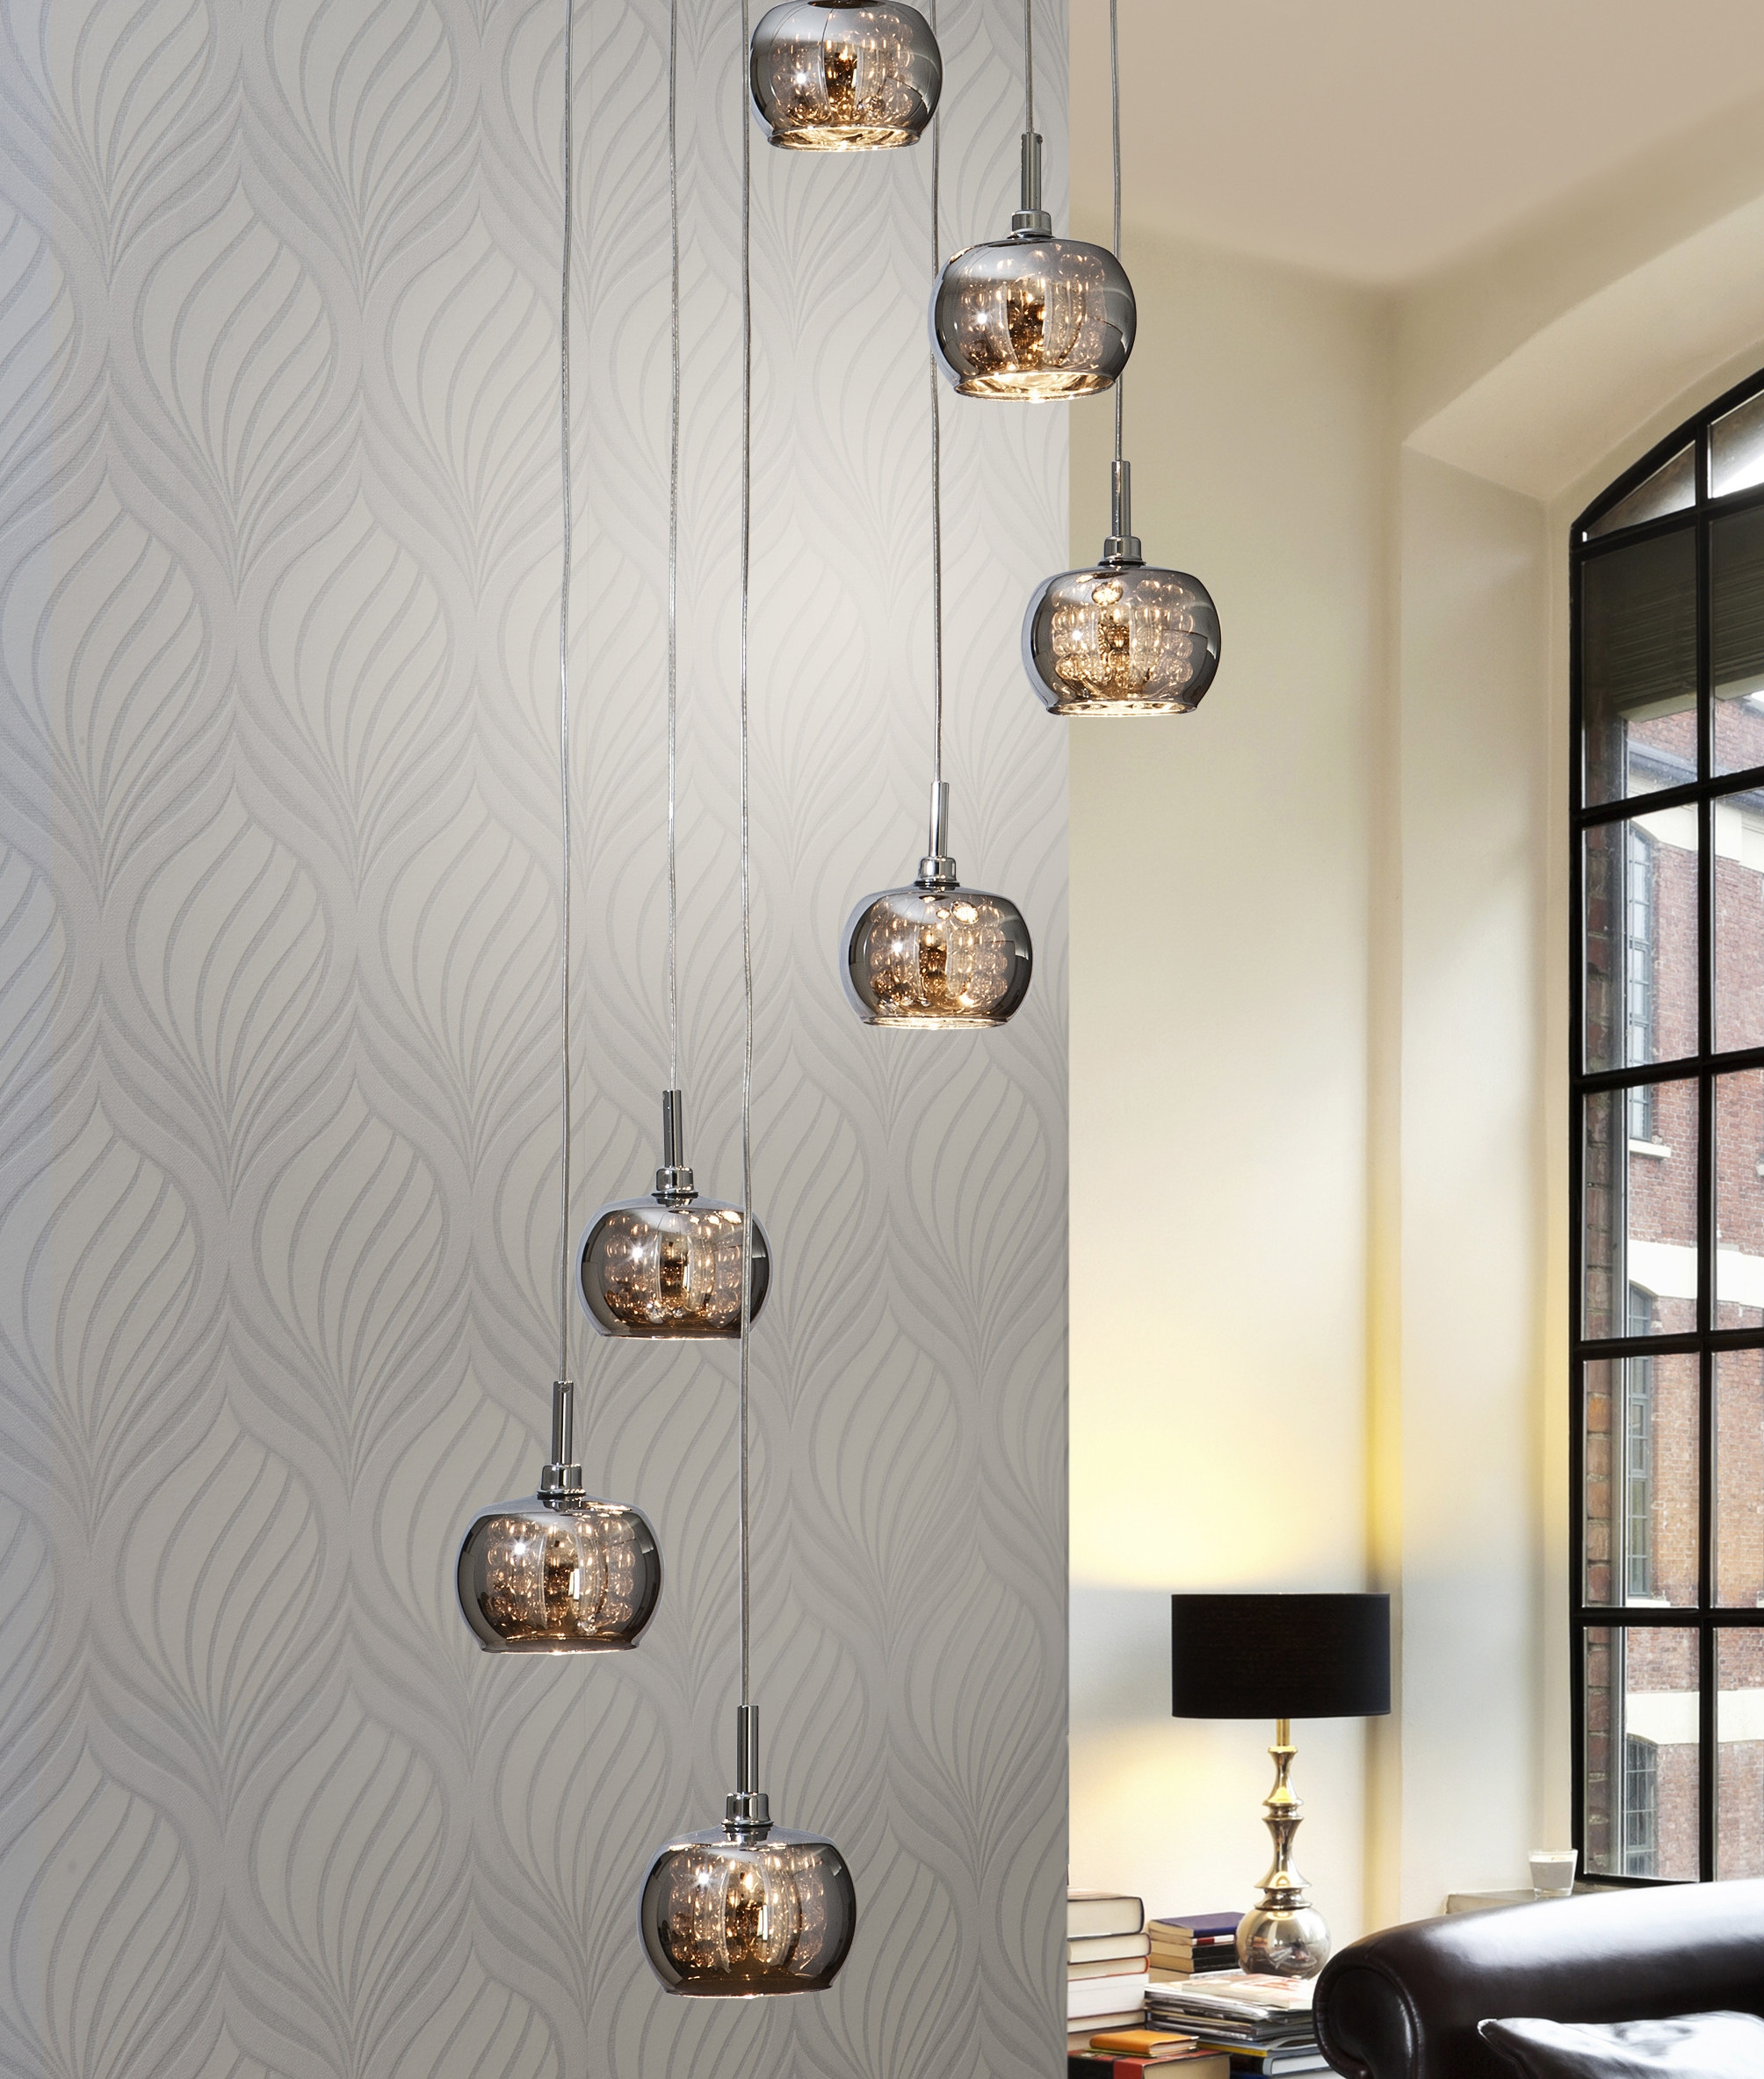 Long Pendant Lights: Long Drop LED Smoked Glass Pendant